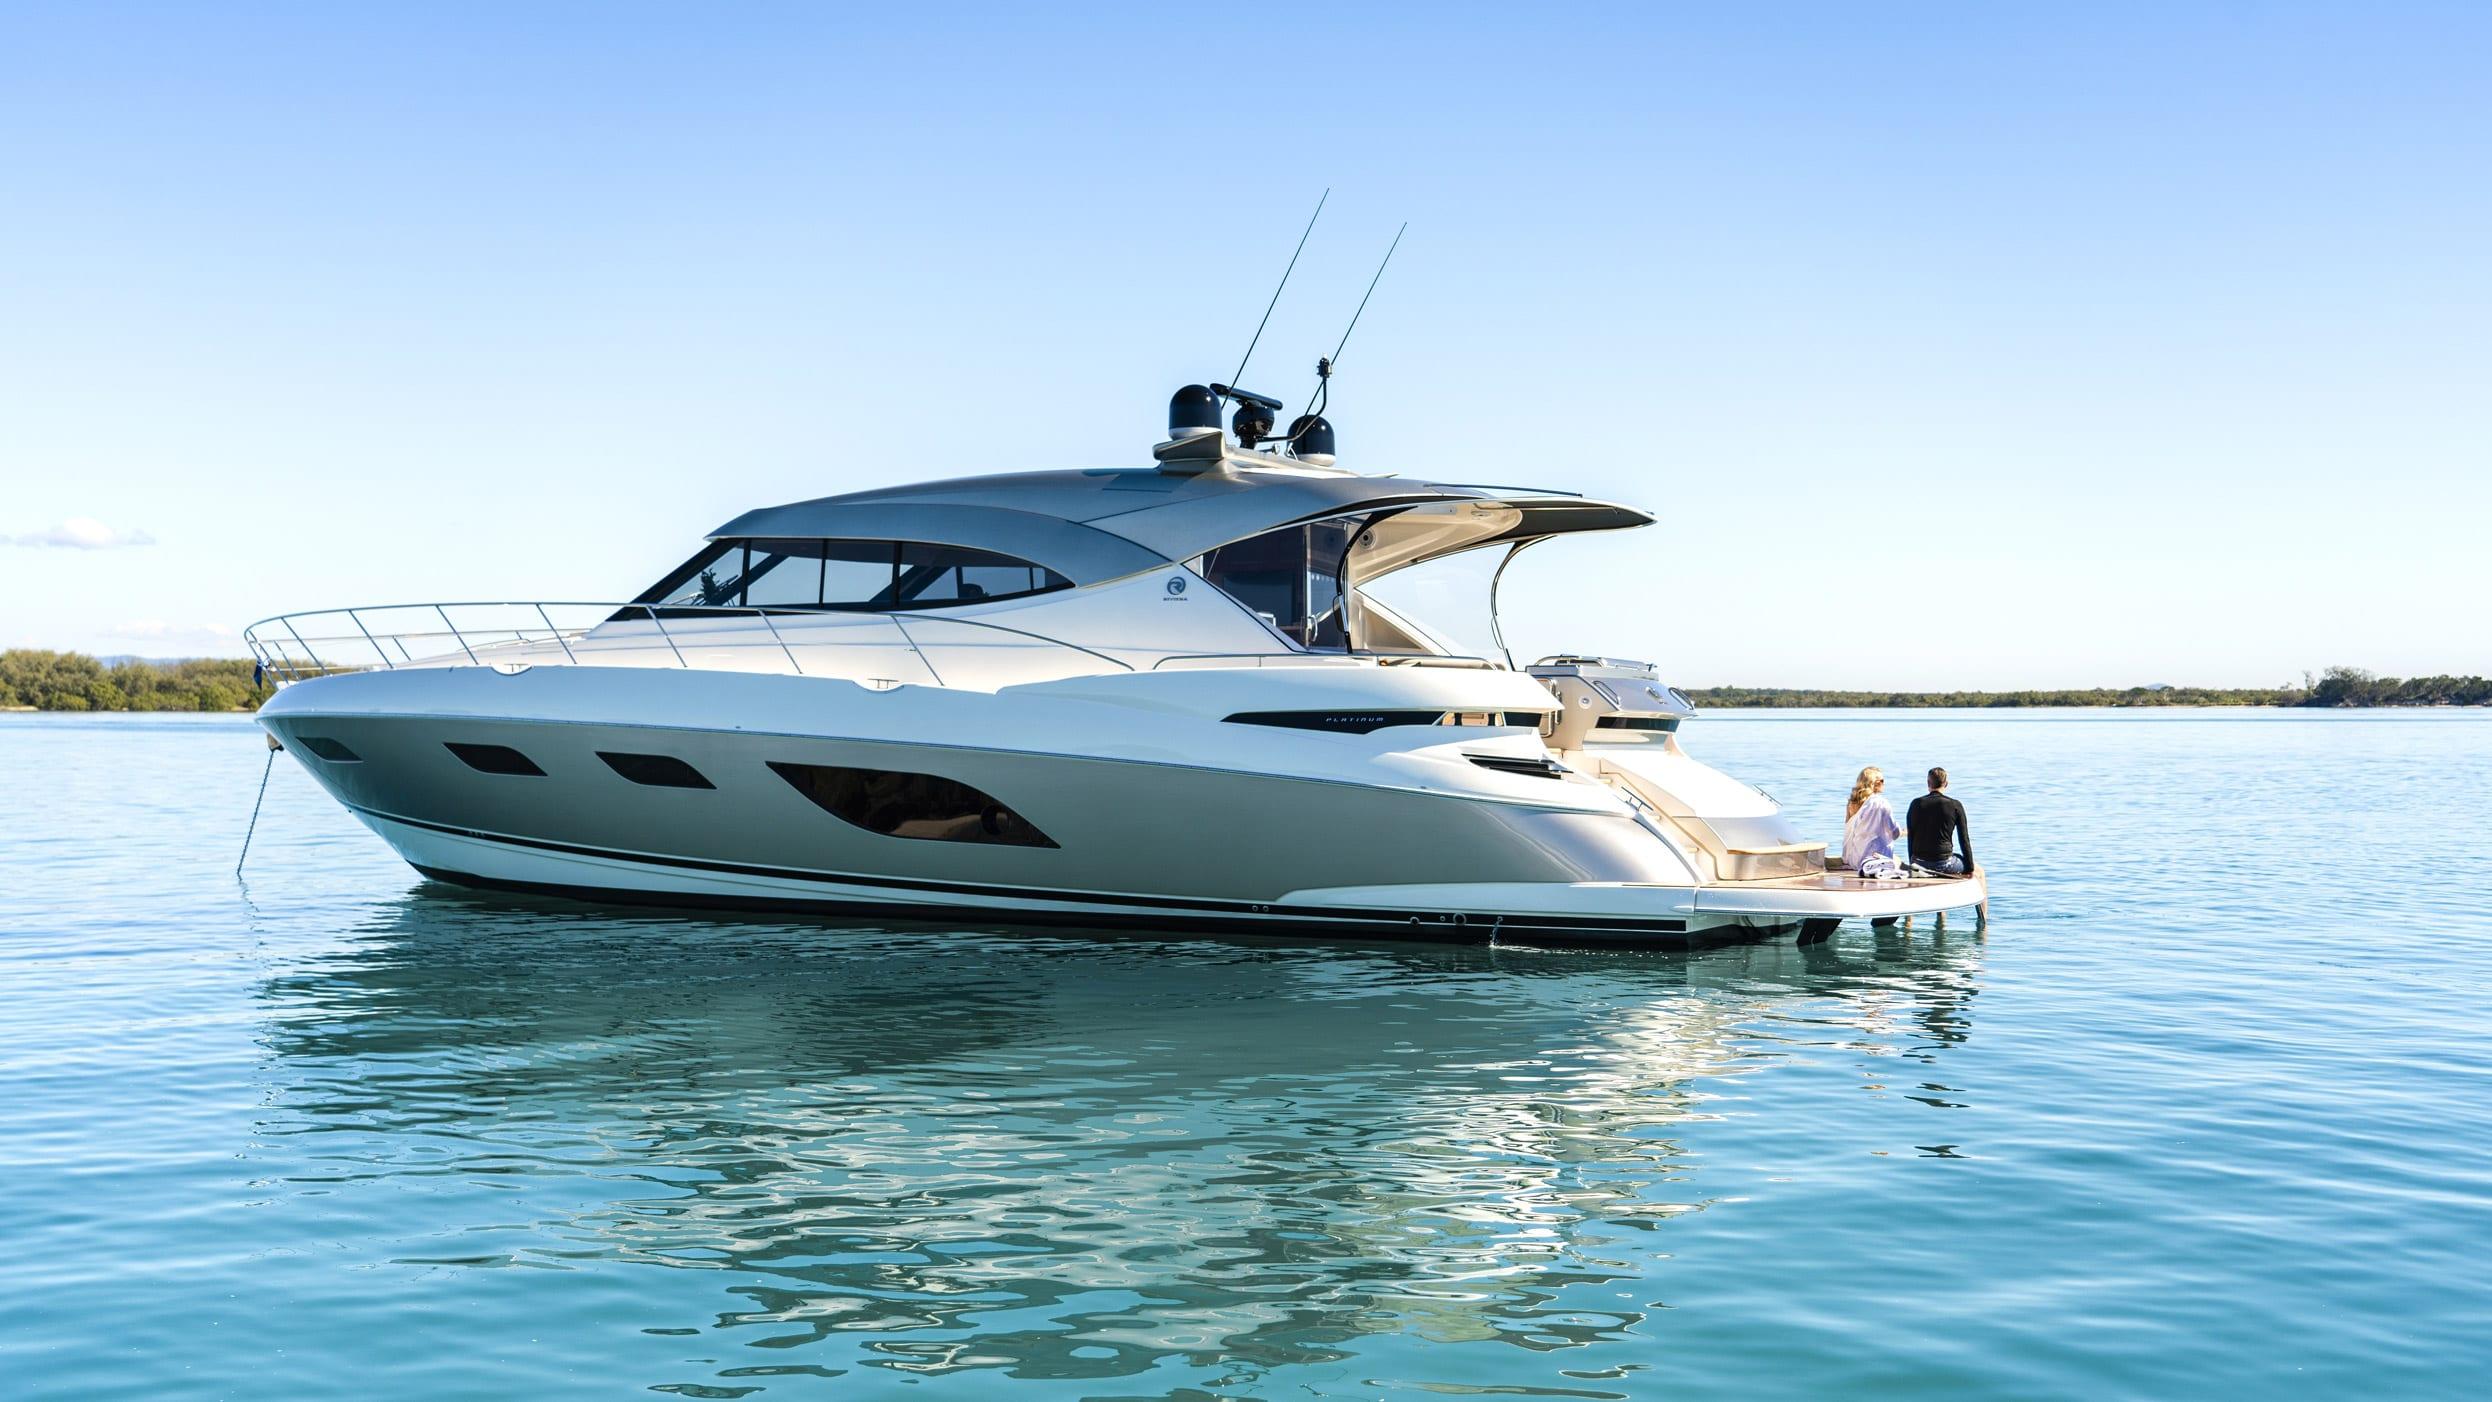 Riviera-6000-Sport-Yacht-Platinum-Edition-Lifestyle-04